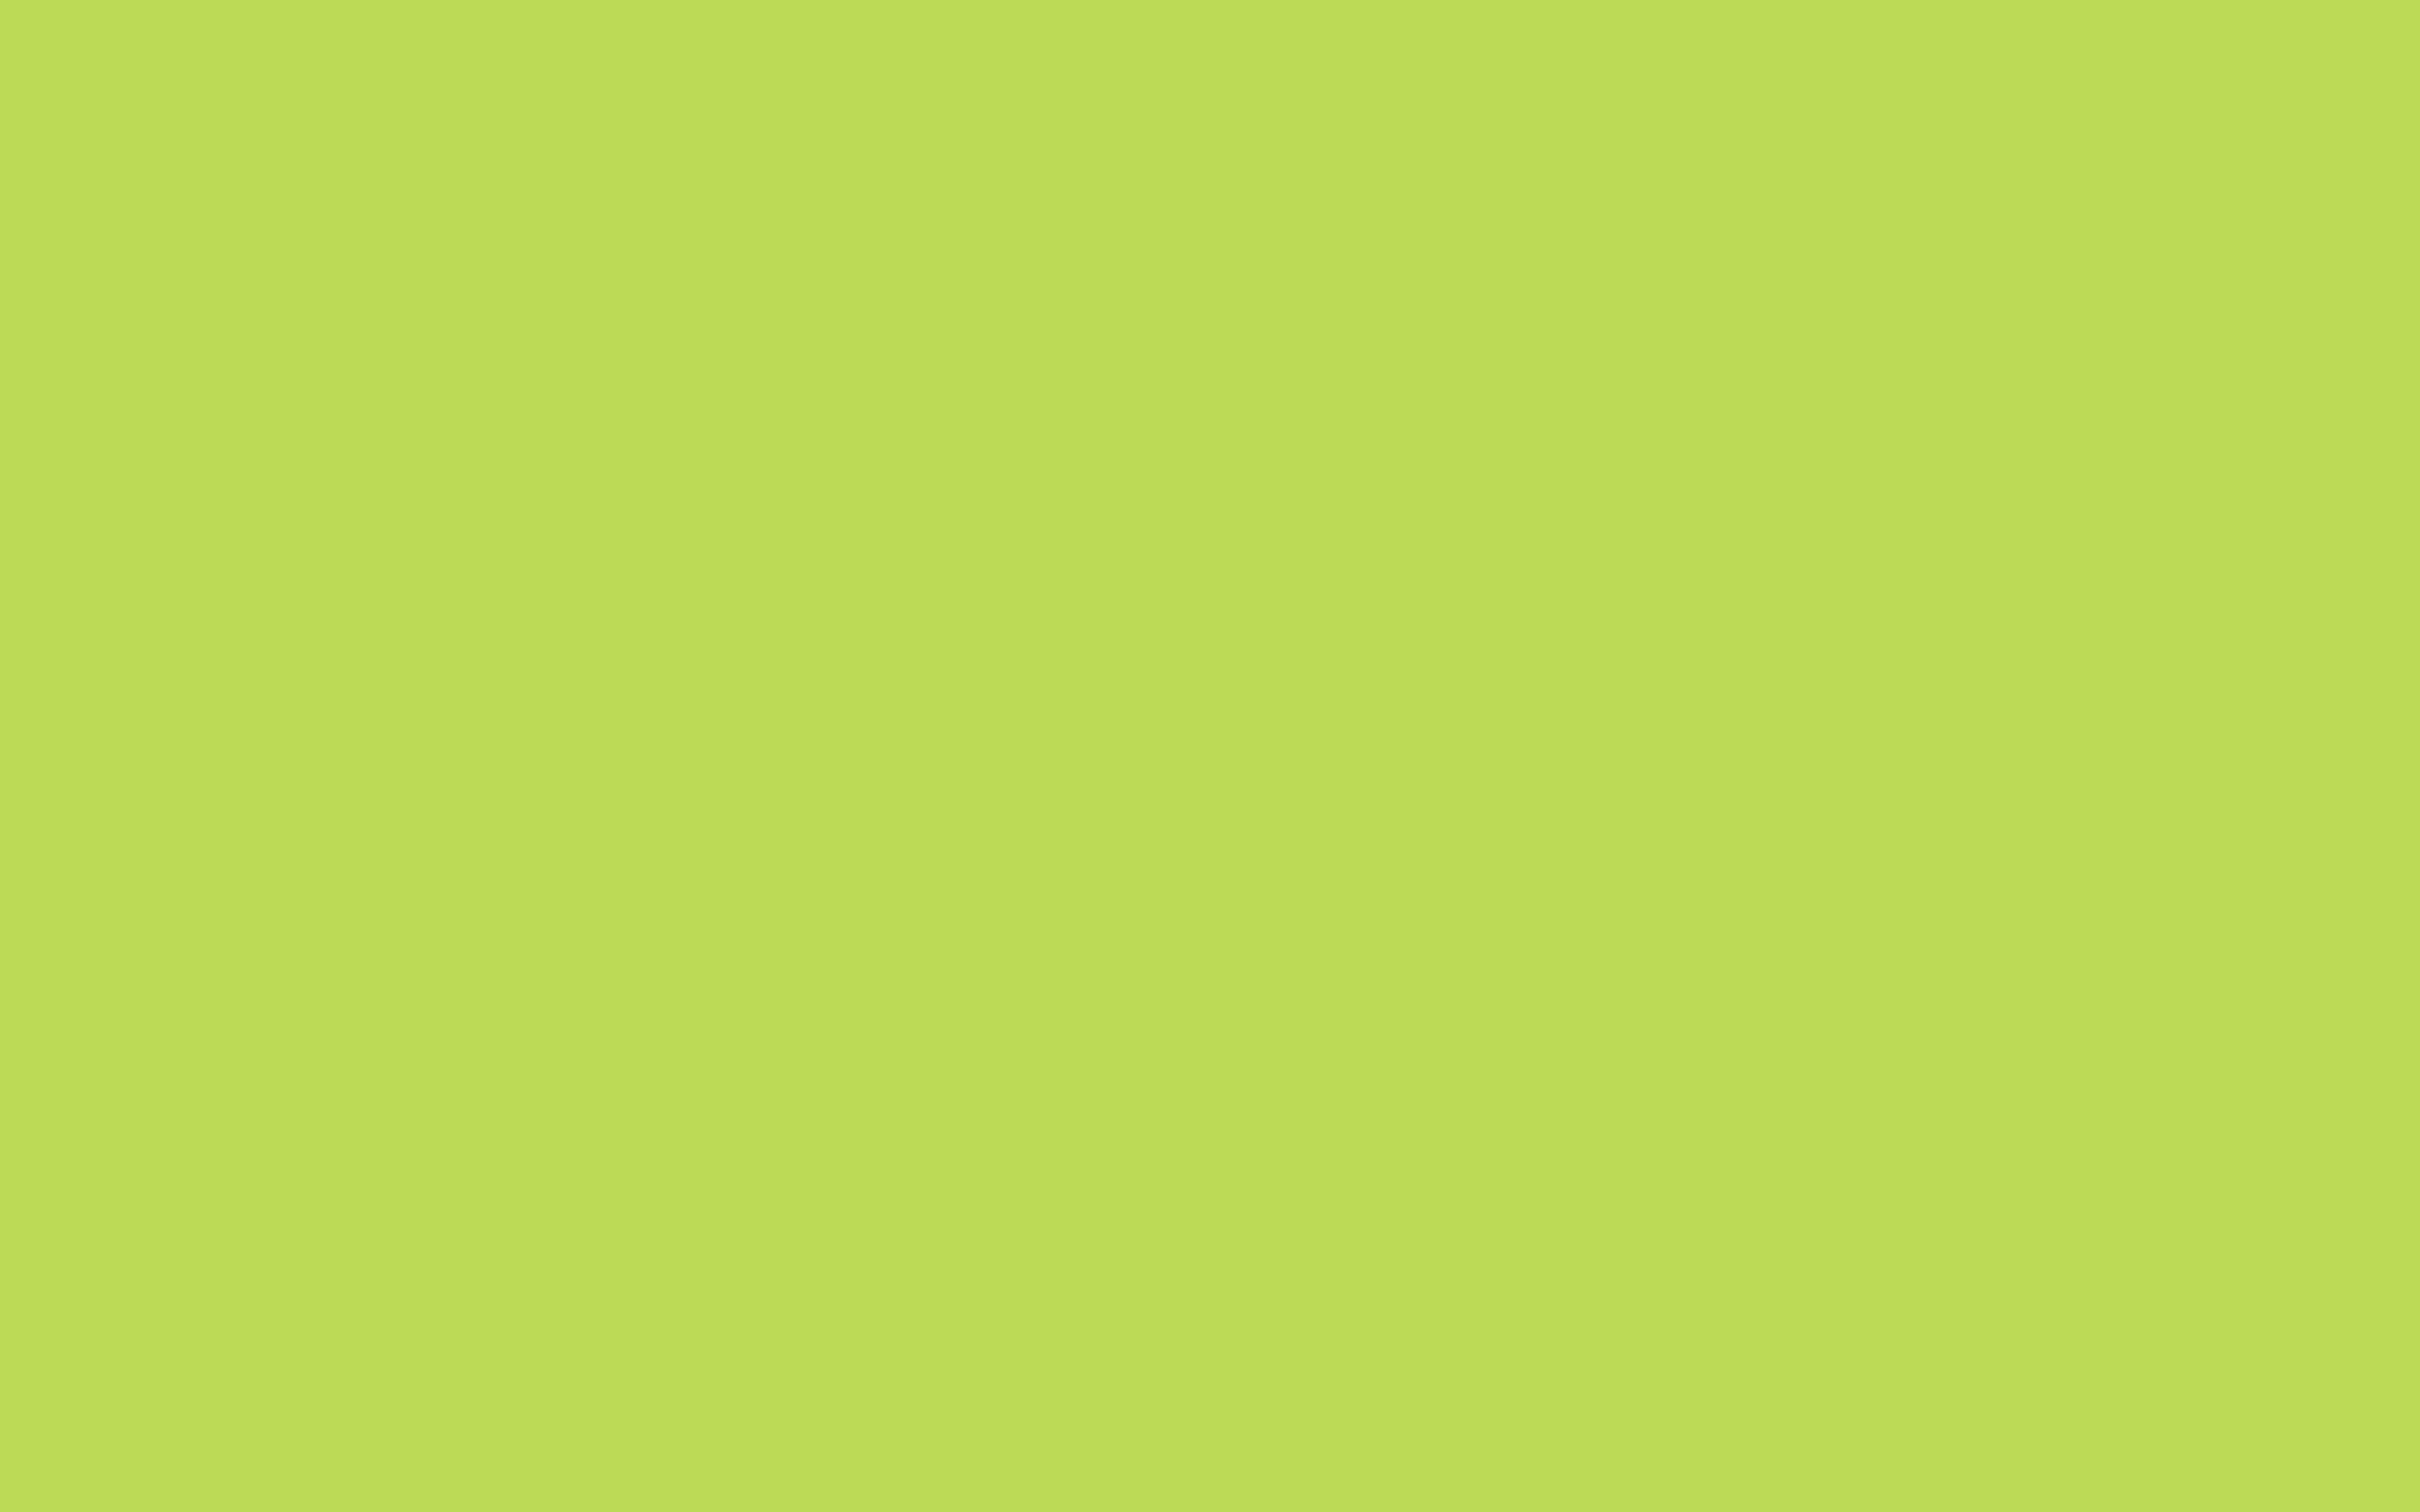 2560x1600 June Bud Solid Color Background